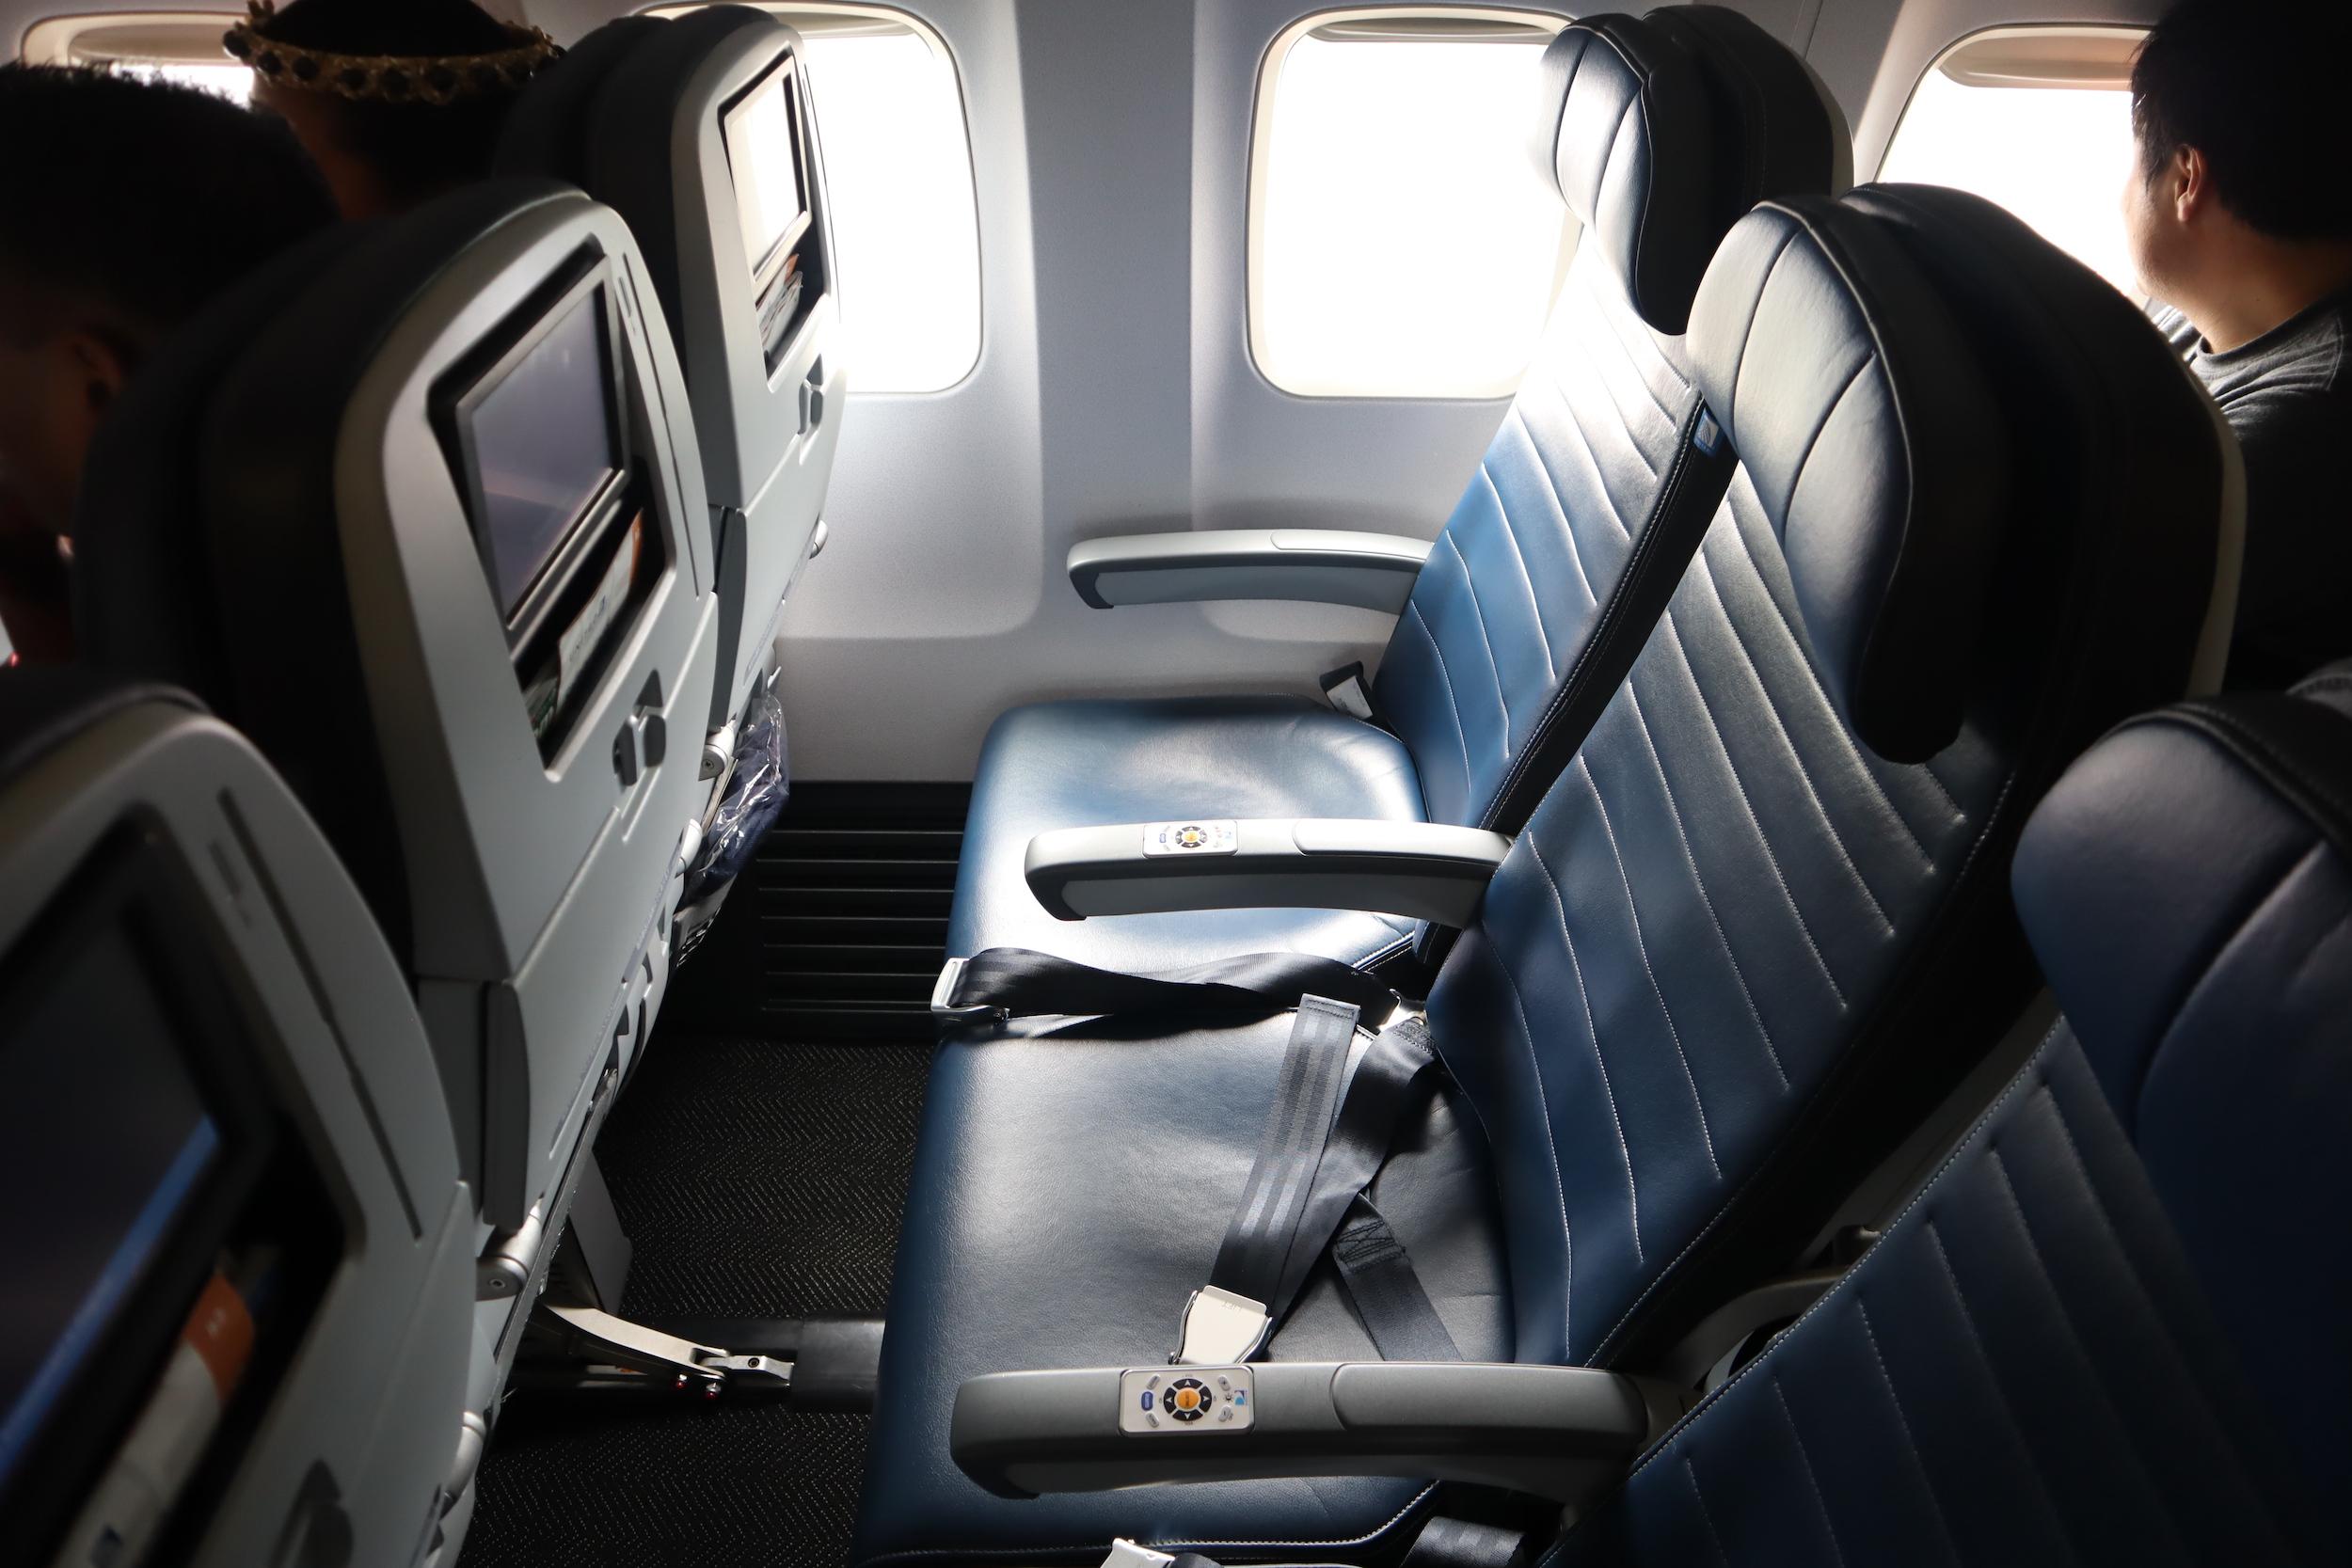 United Flight 155 – Seat 29F